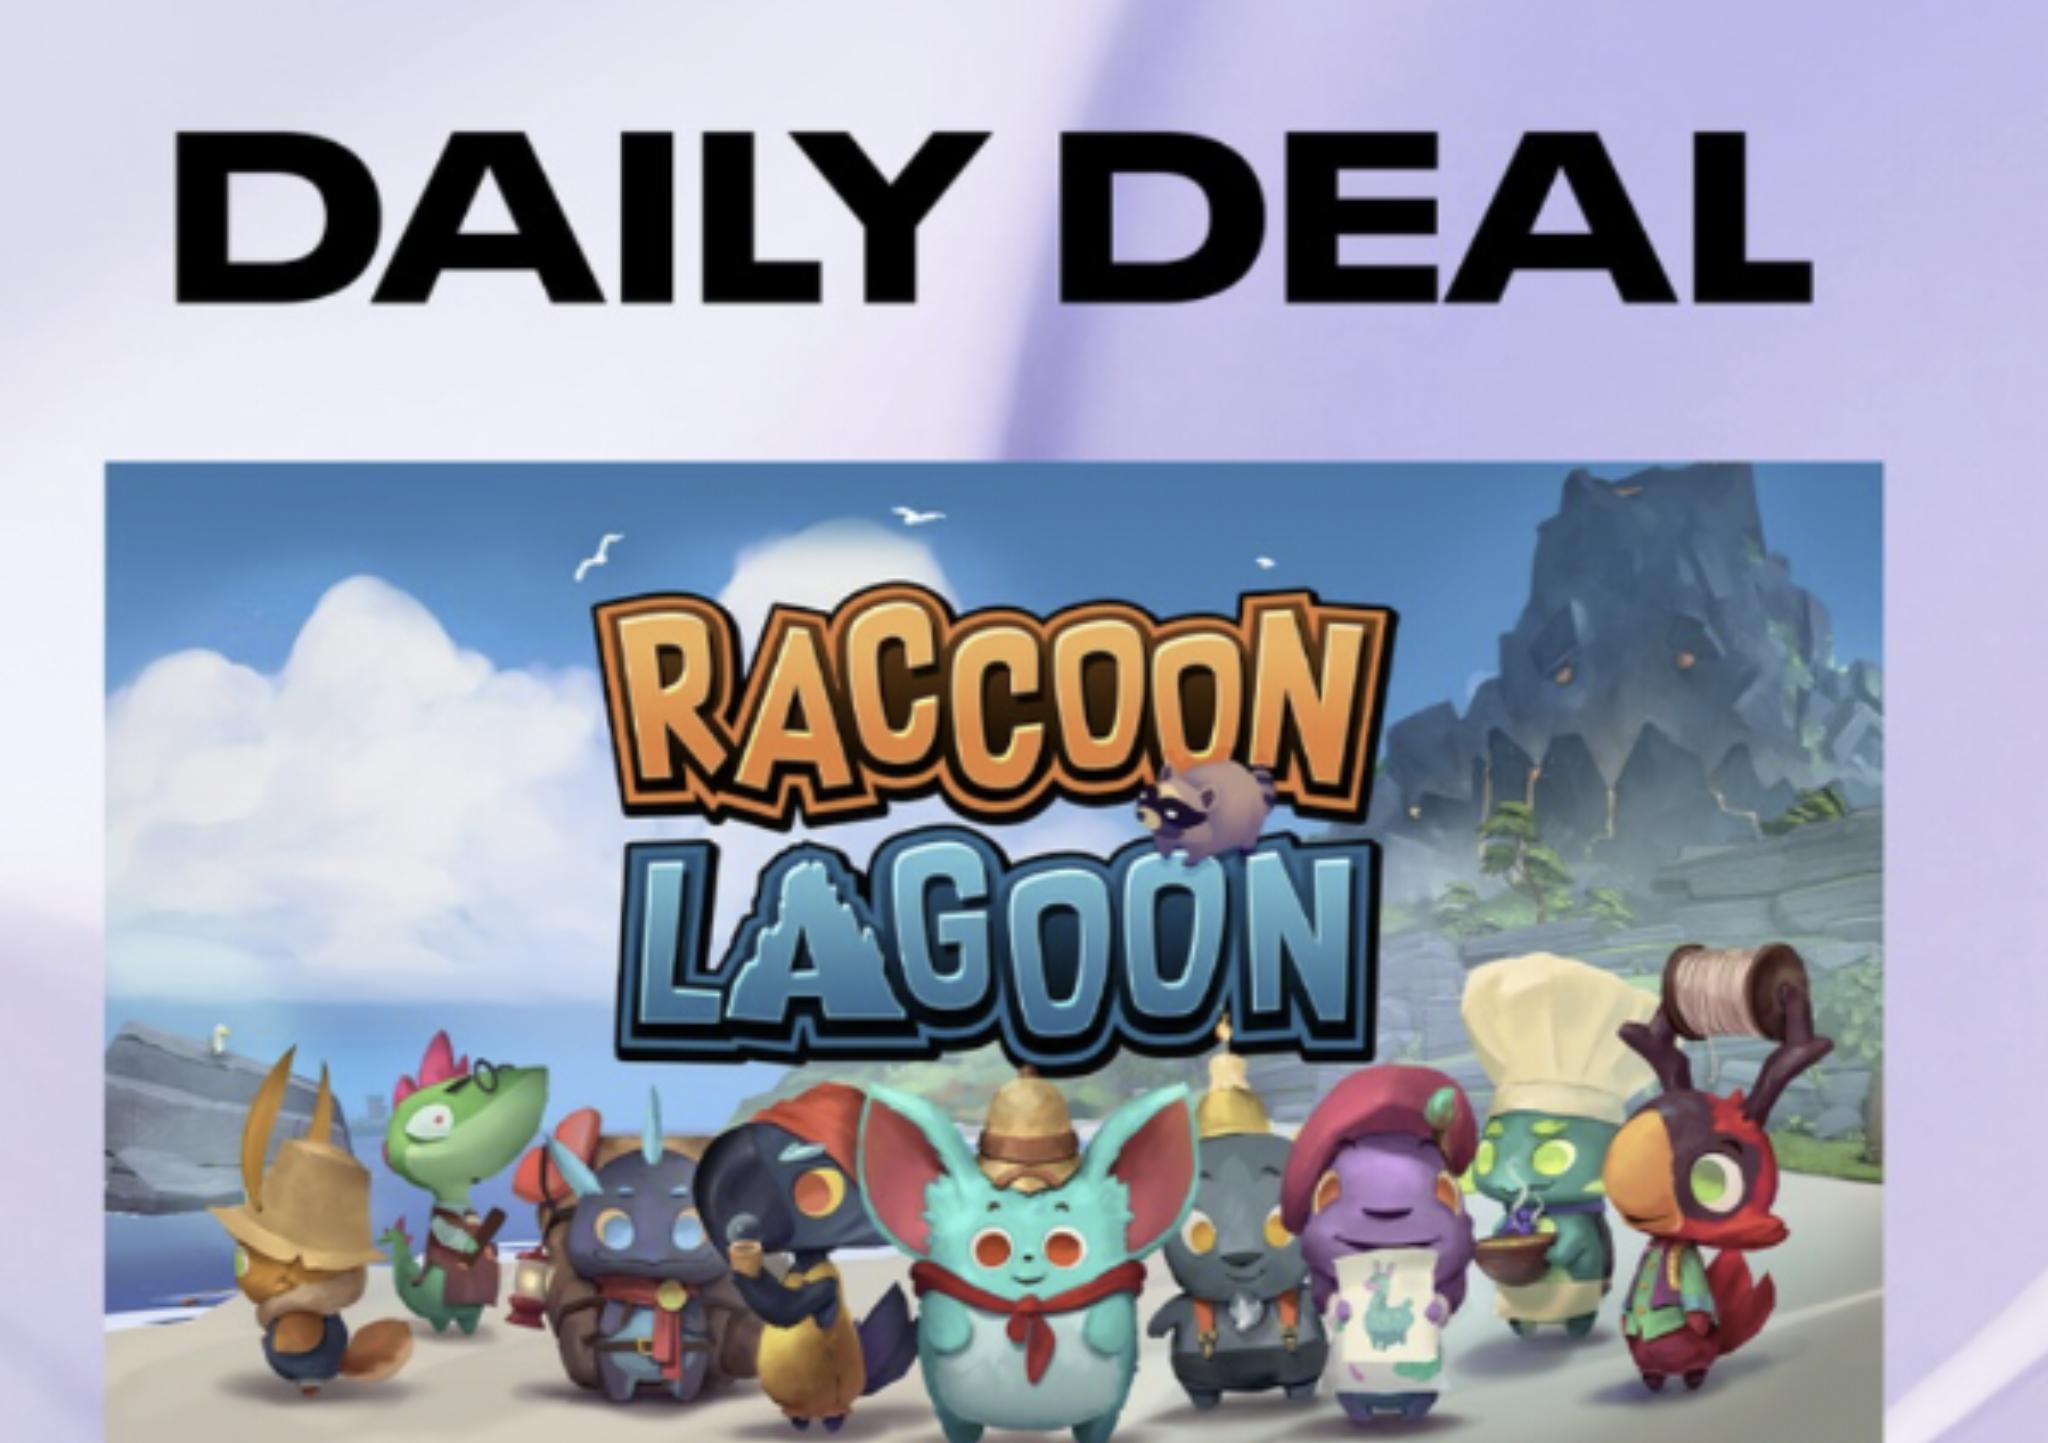 Oculus VR Daily Deal - Raccoon Lagoon £6.99 @ Oculus